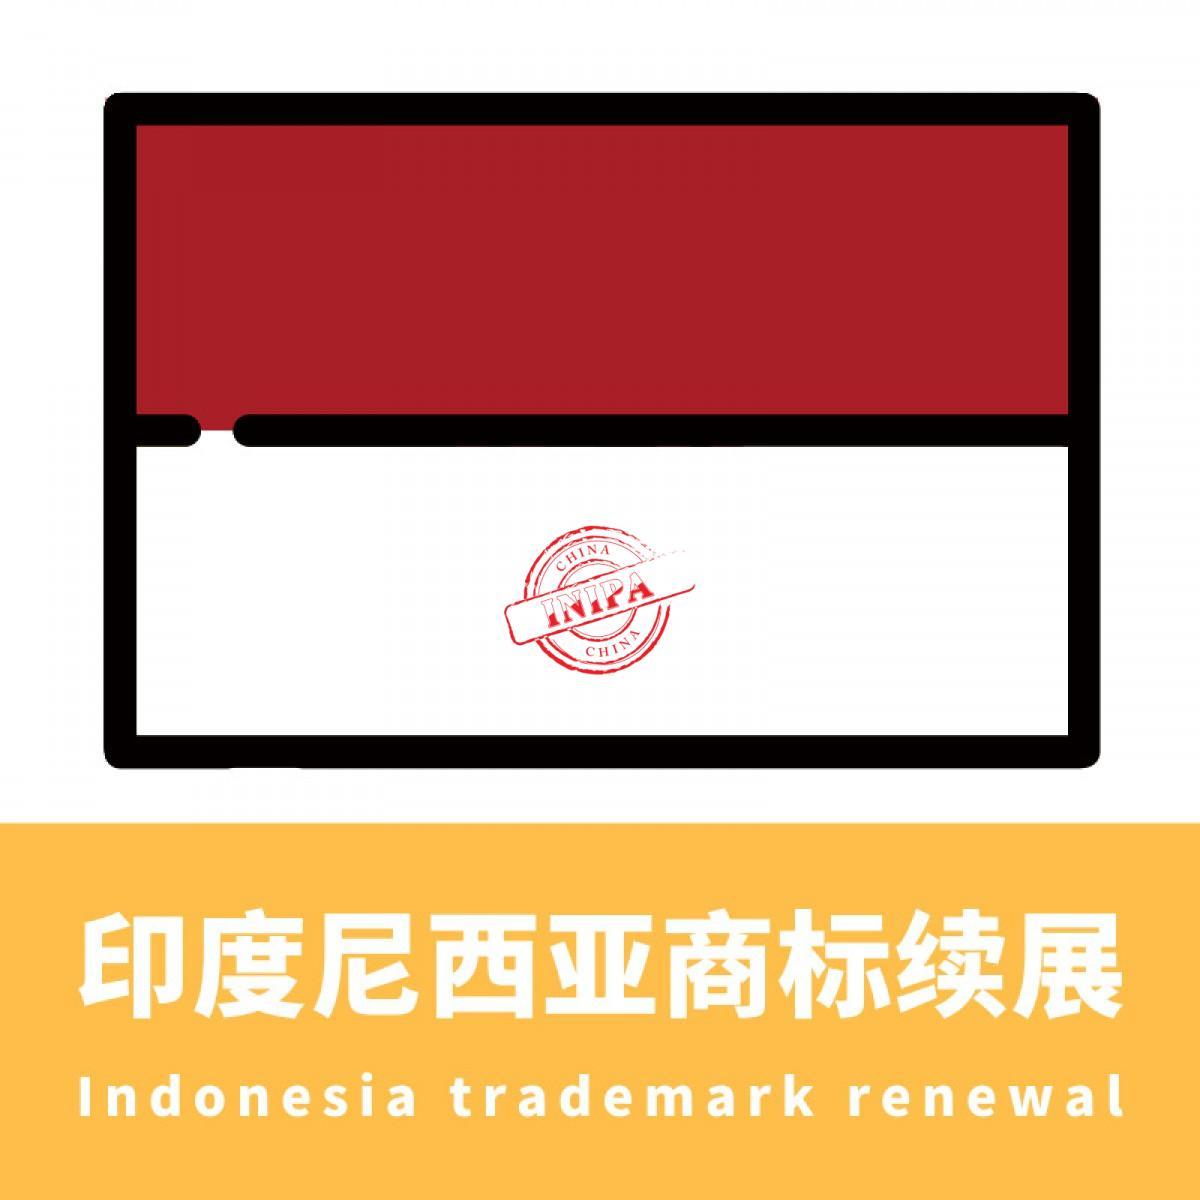 印度尼西亚商标续展/Indonesia trademark renewal